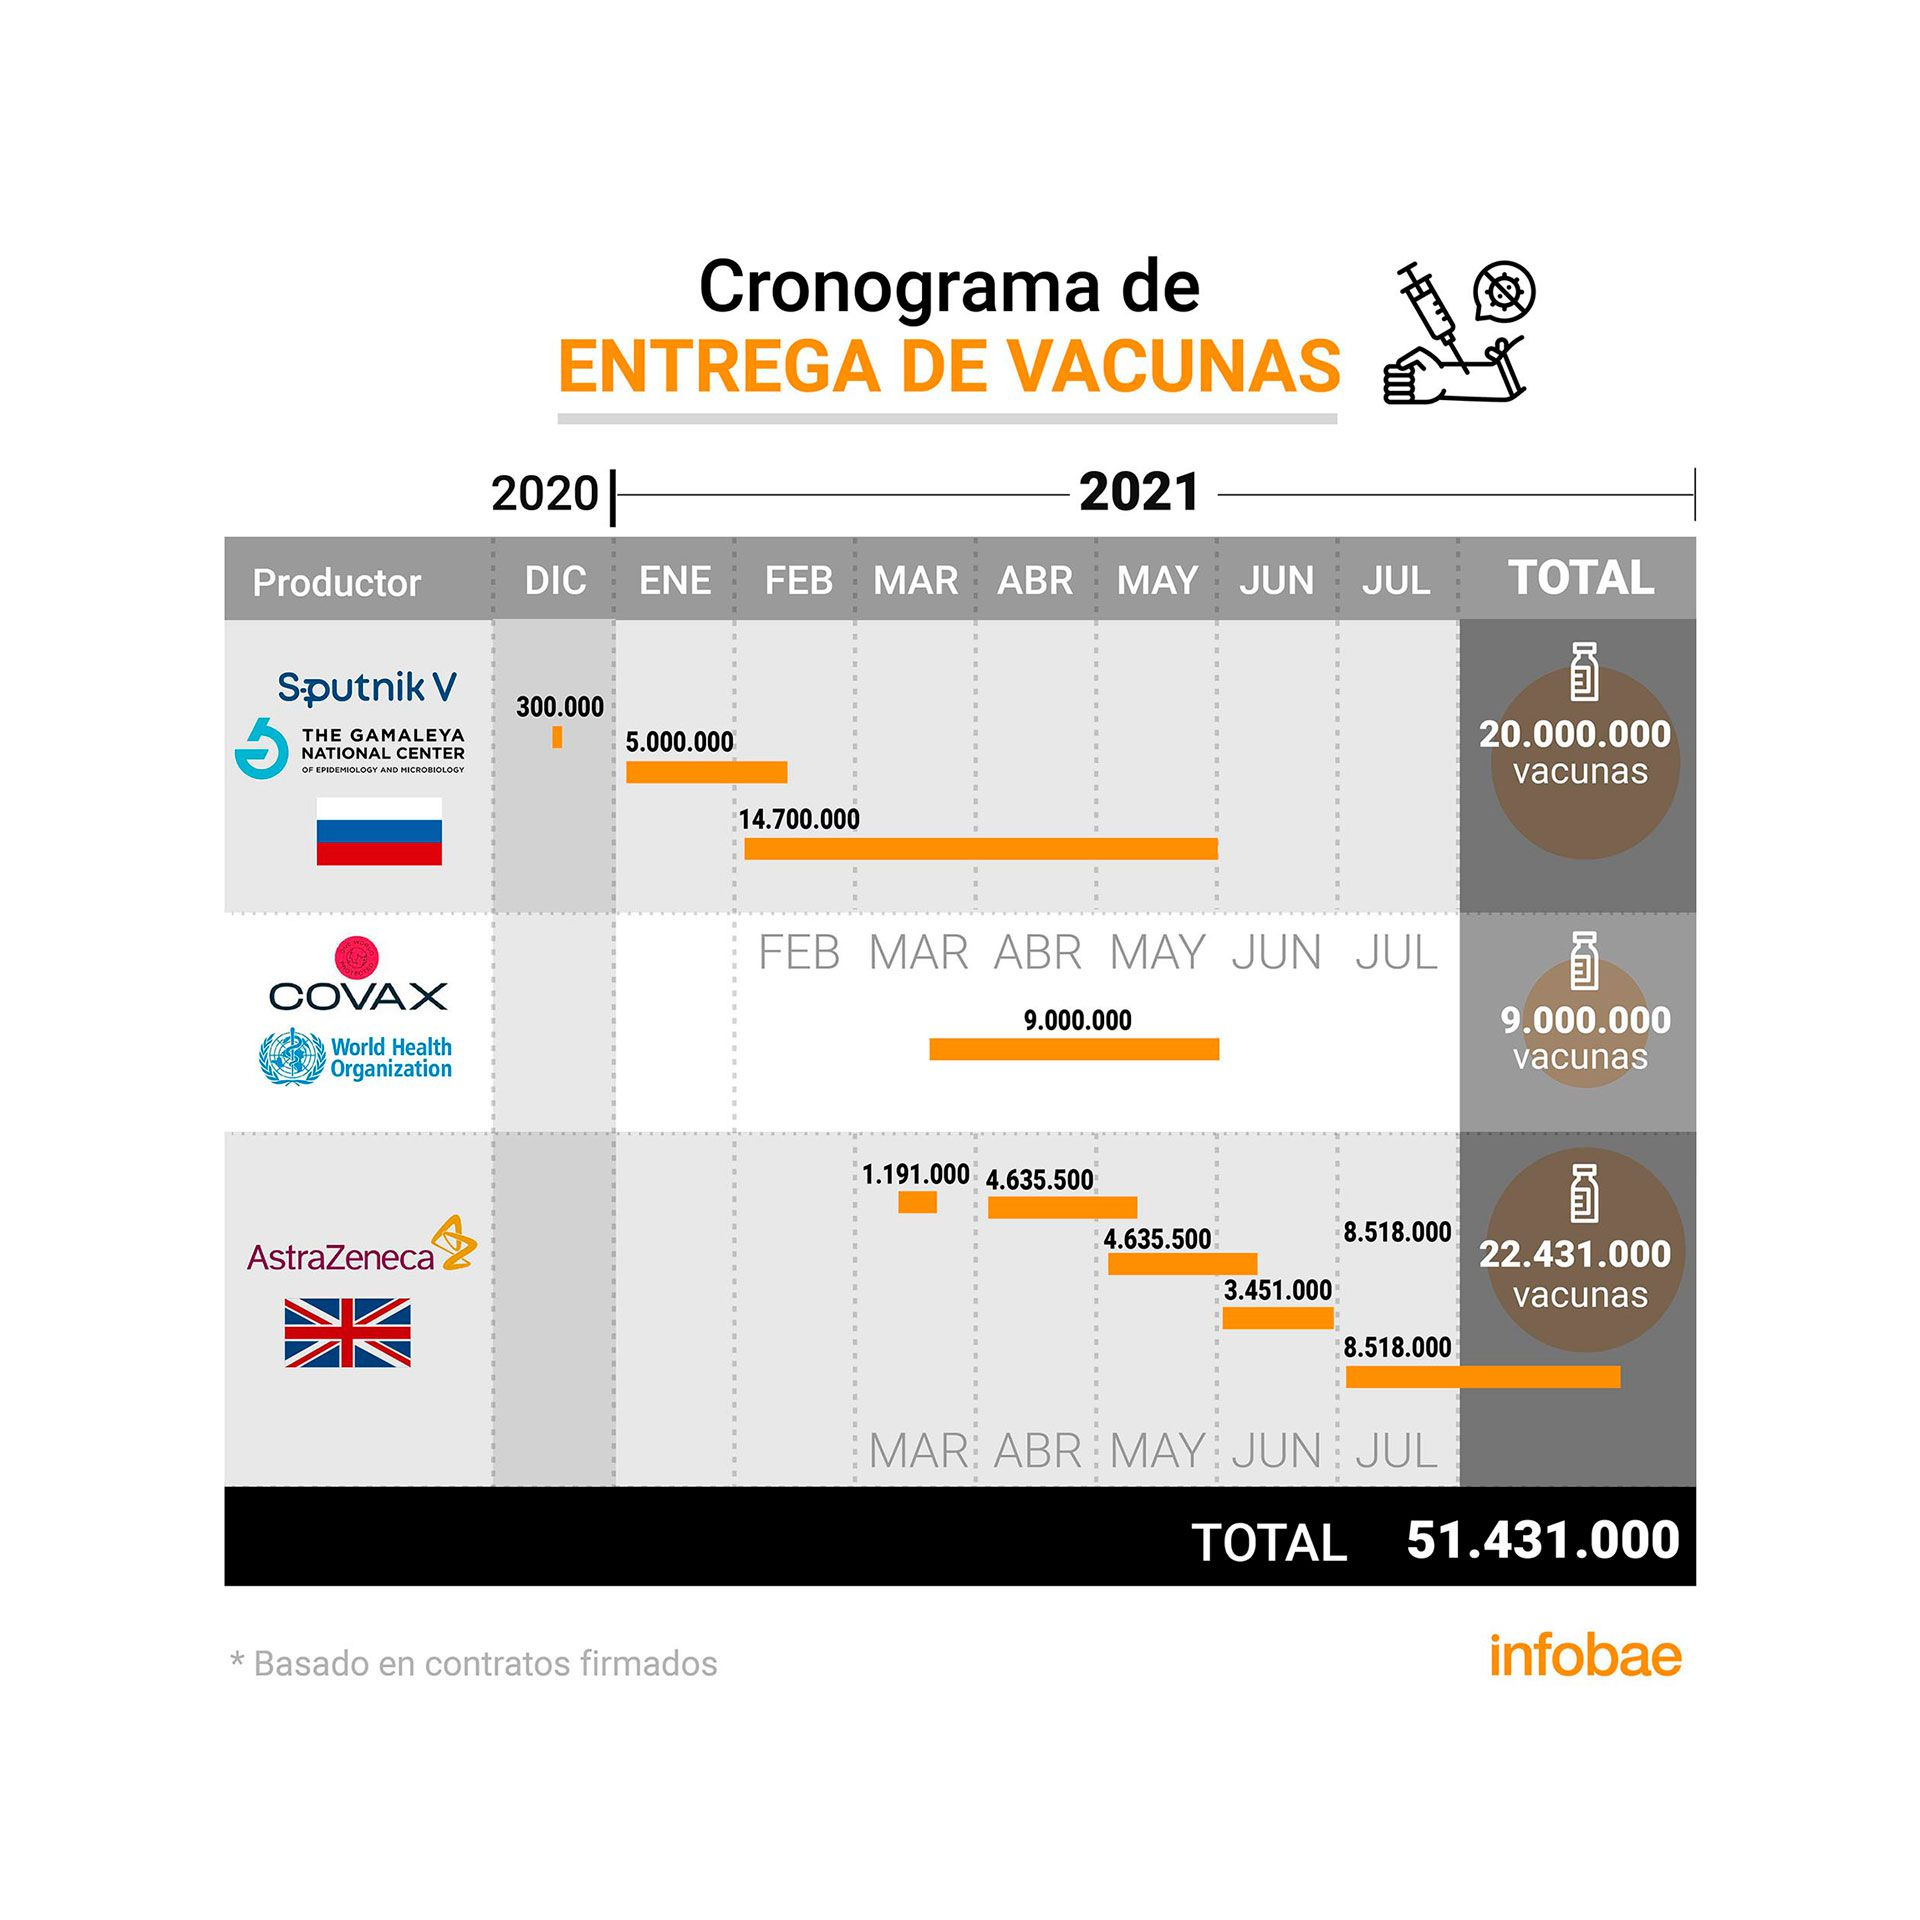 Cronograma entrega vacunas Infografia